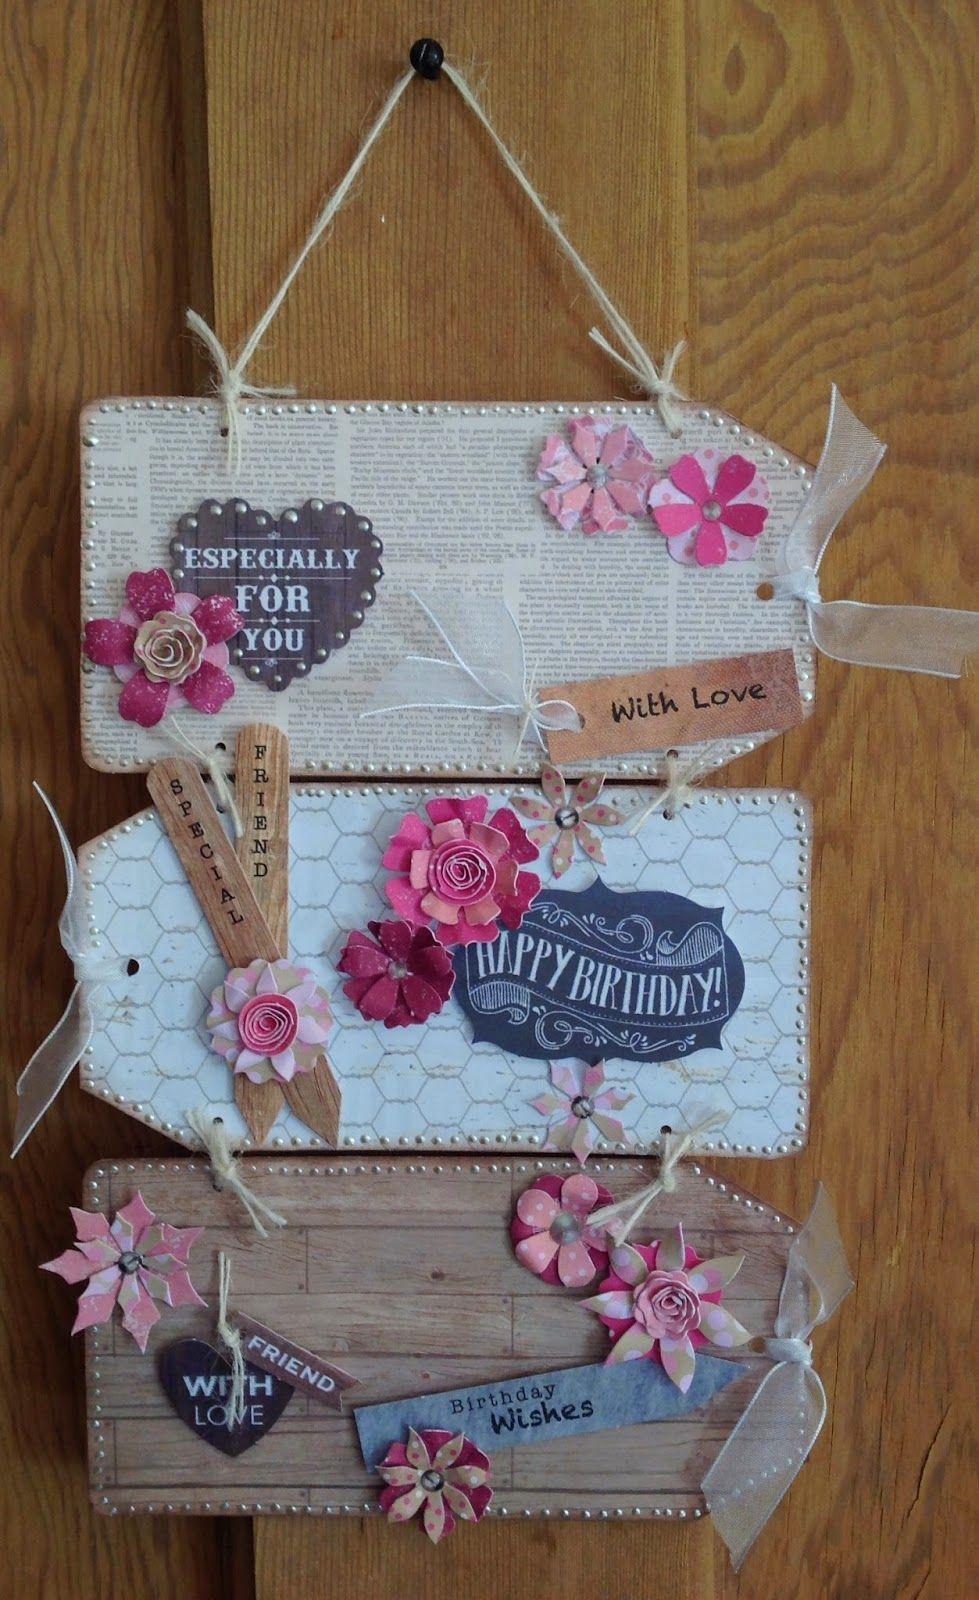 Birthday door hanger | Mamá! | Pinterest | De puerta, Mamá y Cuadro